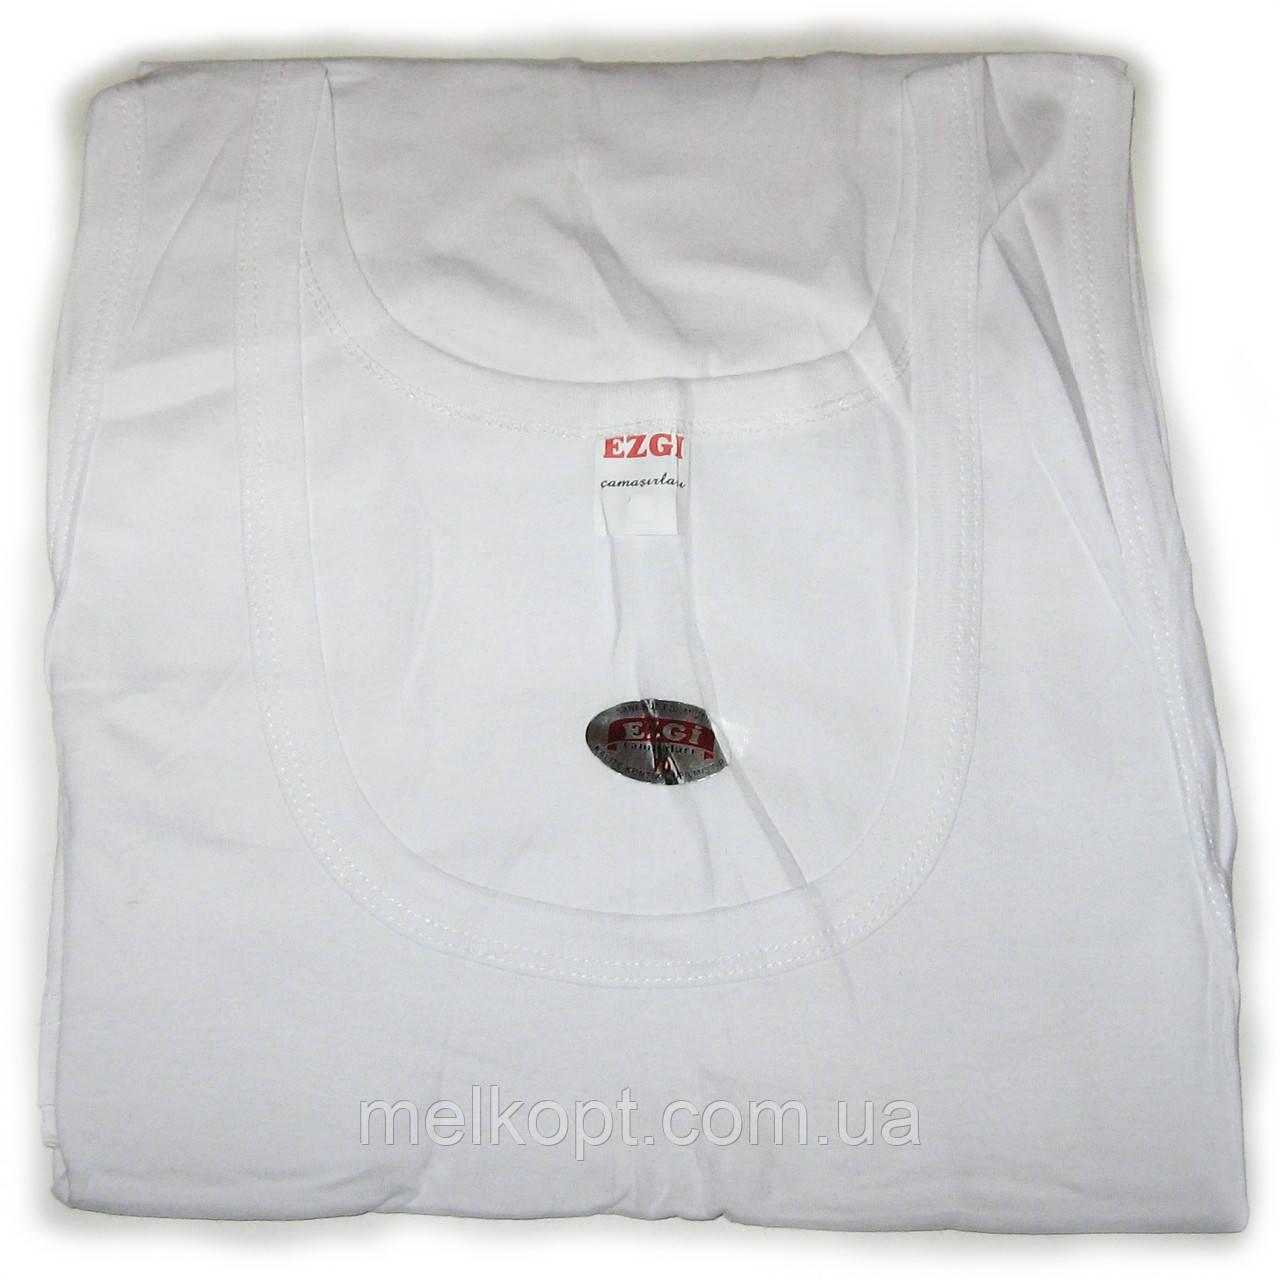 Мужские майки Ezgi - 48,00 грн./шт. (70-й размер, белые)